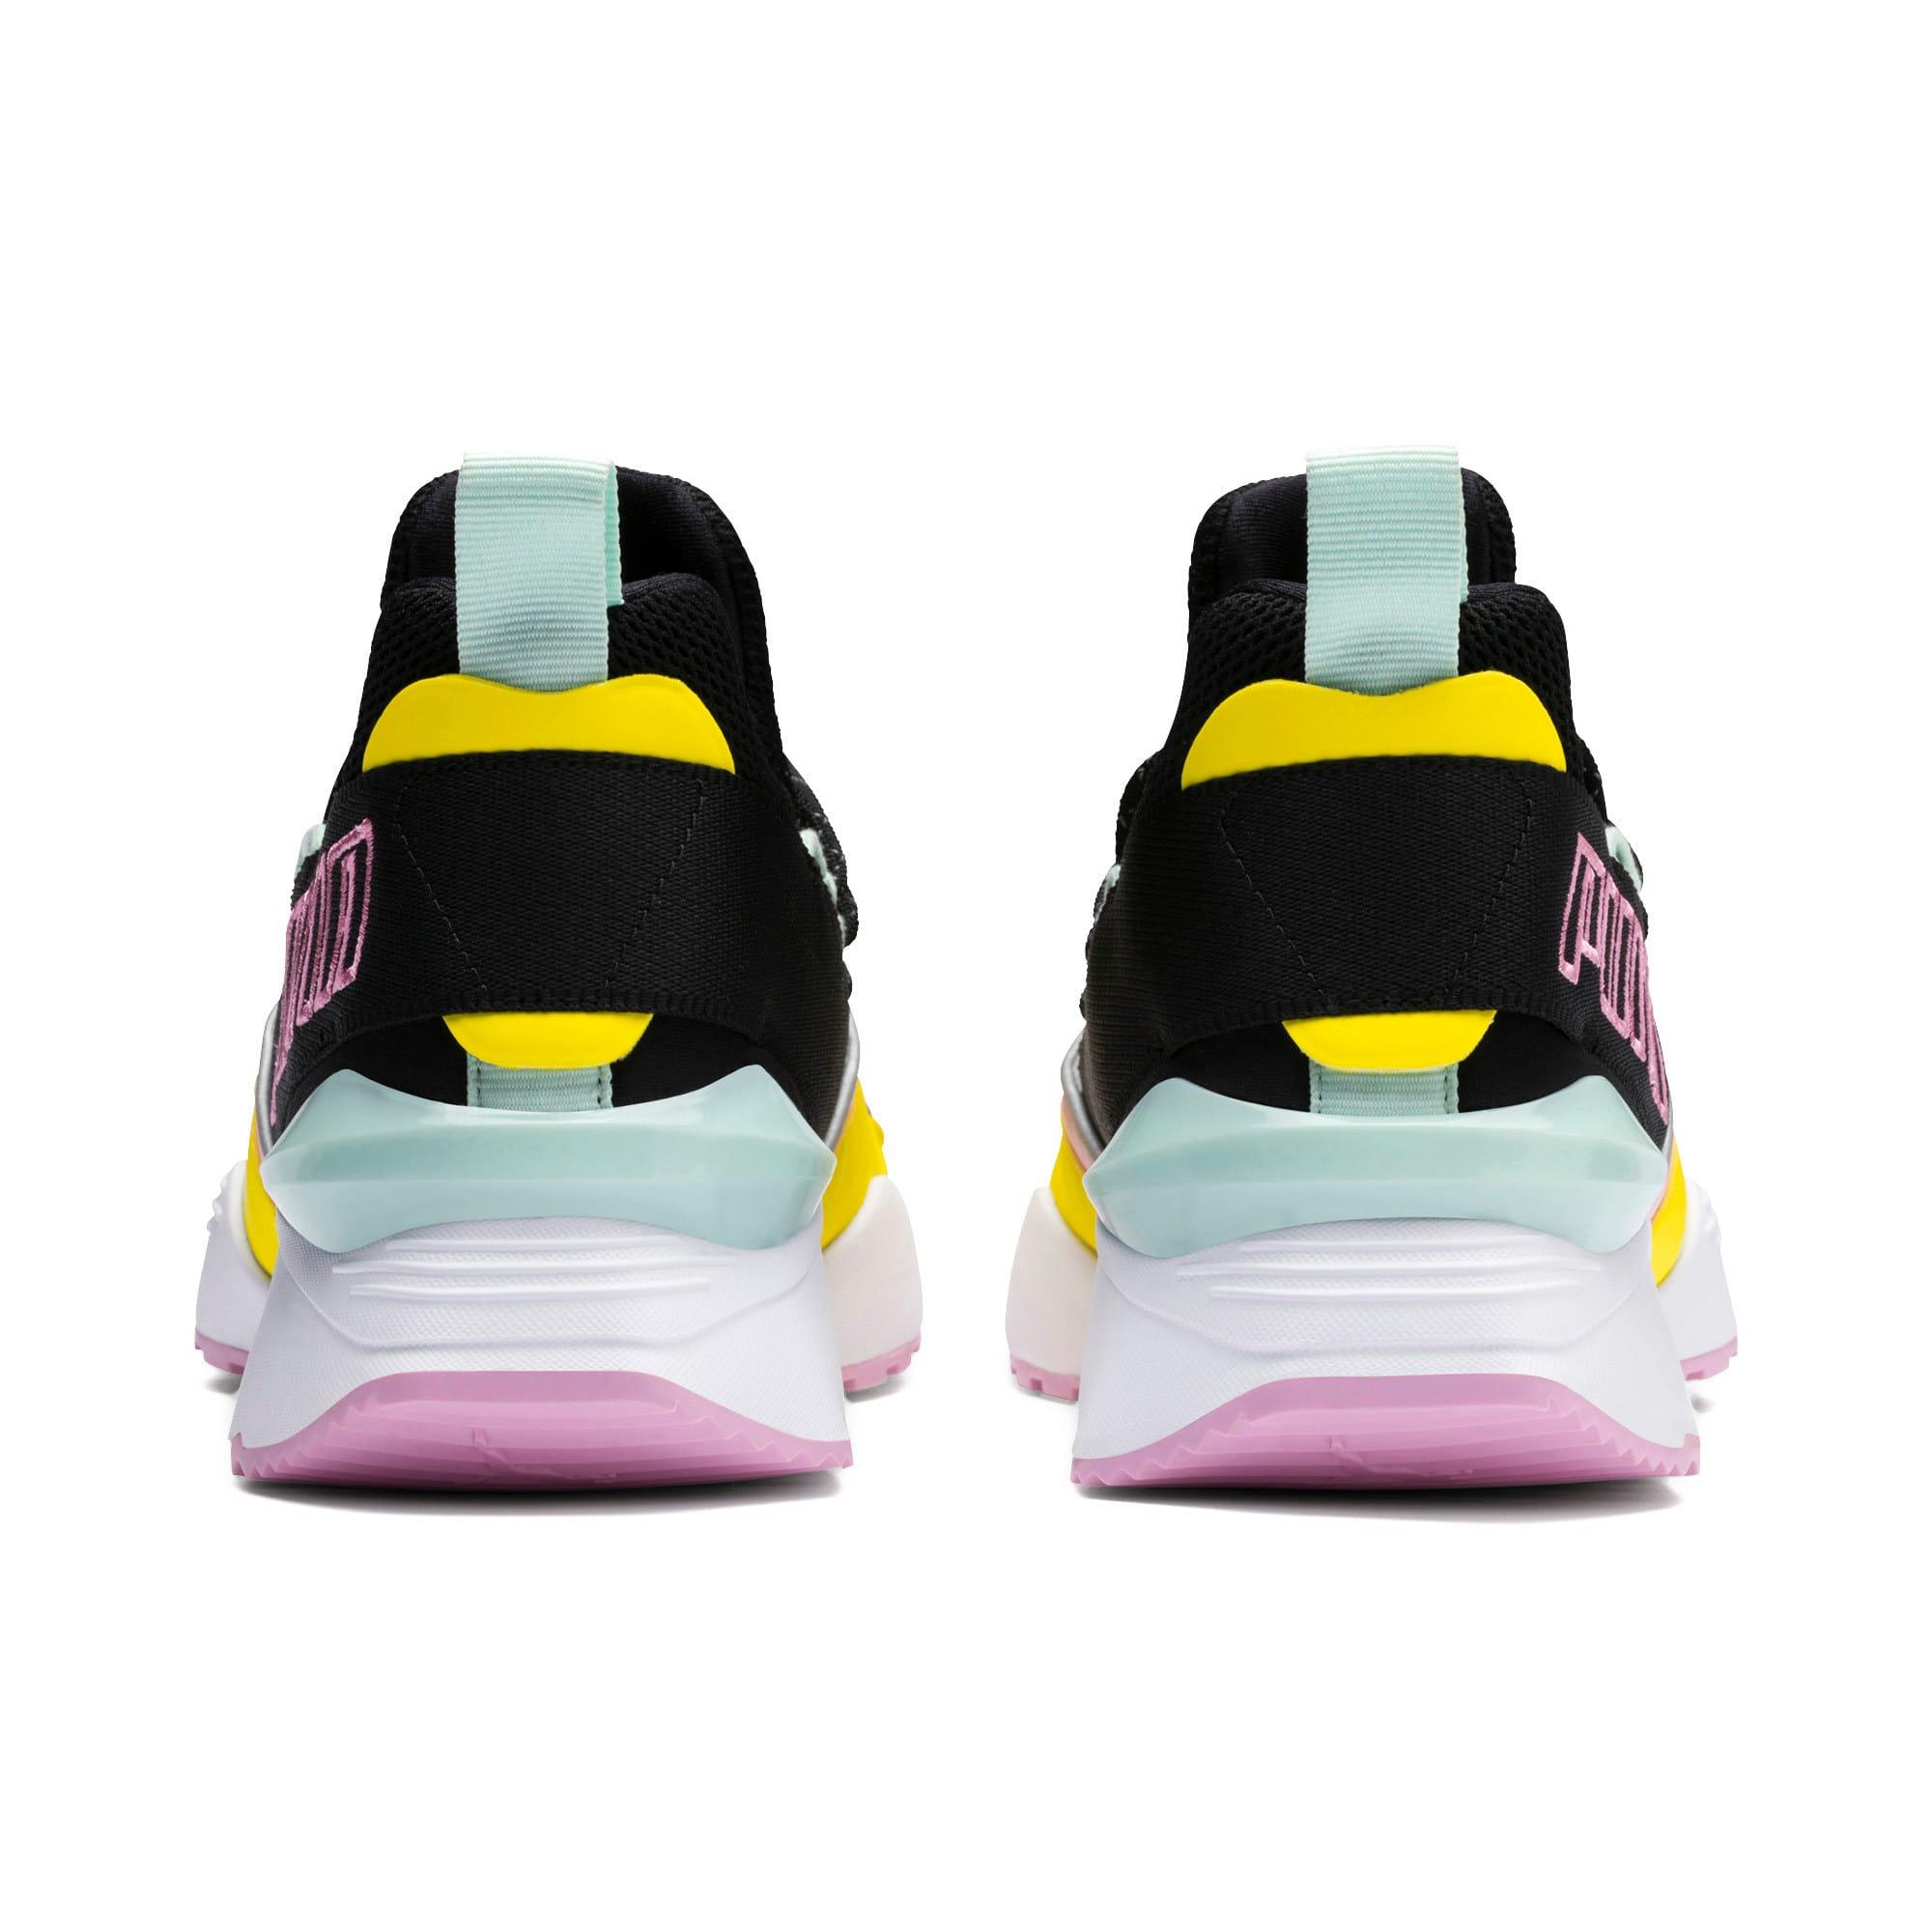 Thumbnail 4 of Muse Maia TZ Damen Sneaker, Puma Black-Blazing Yellow, medium